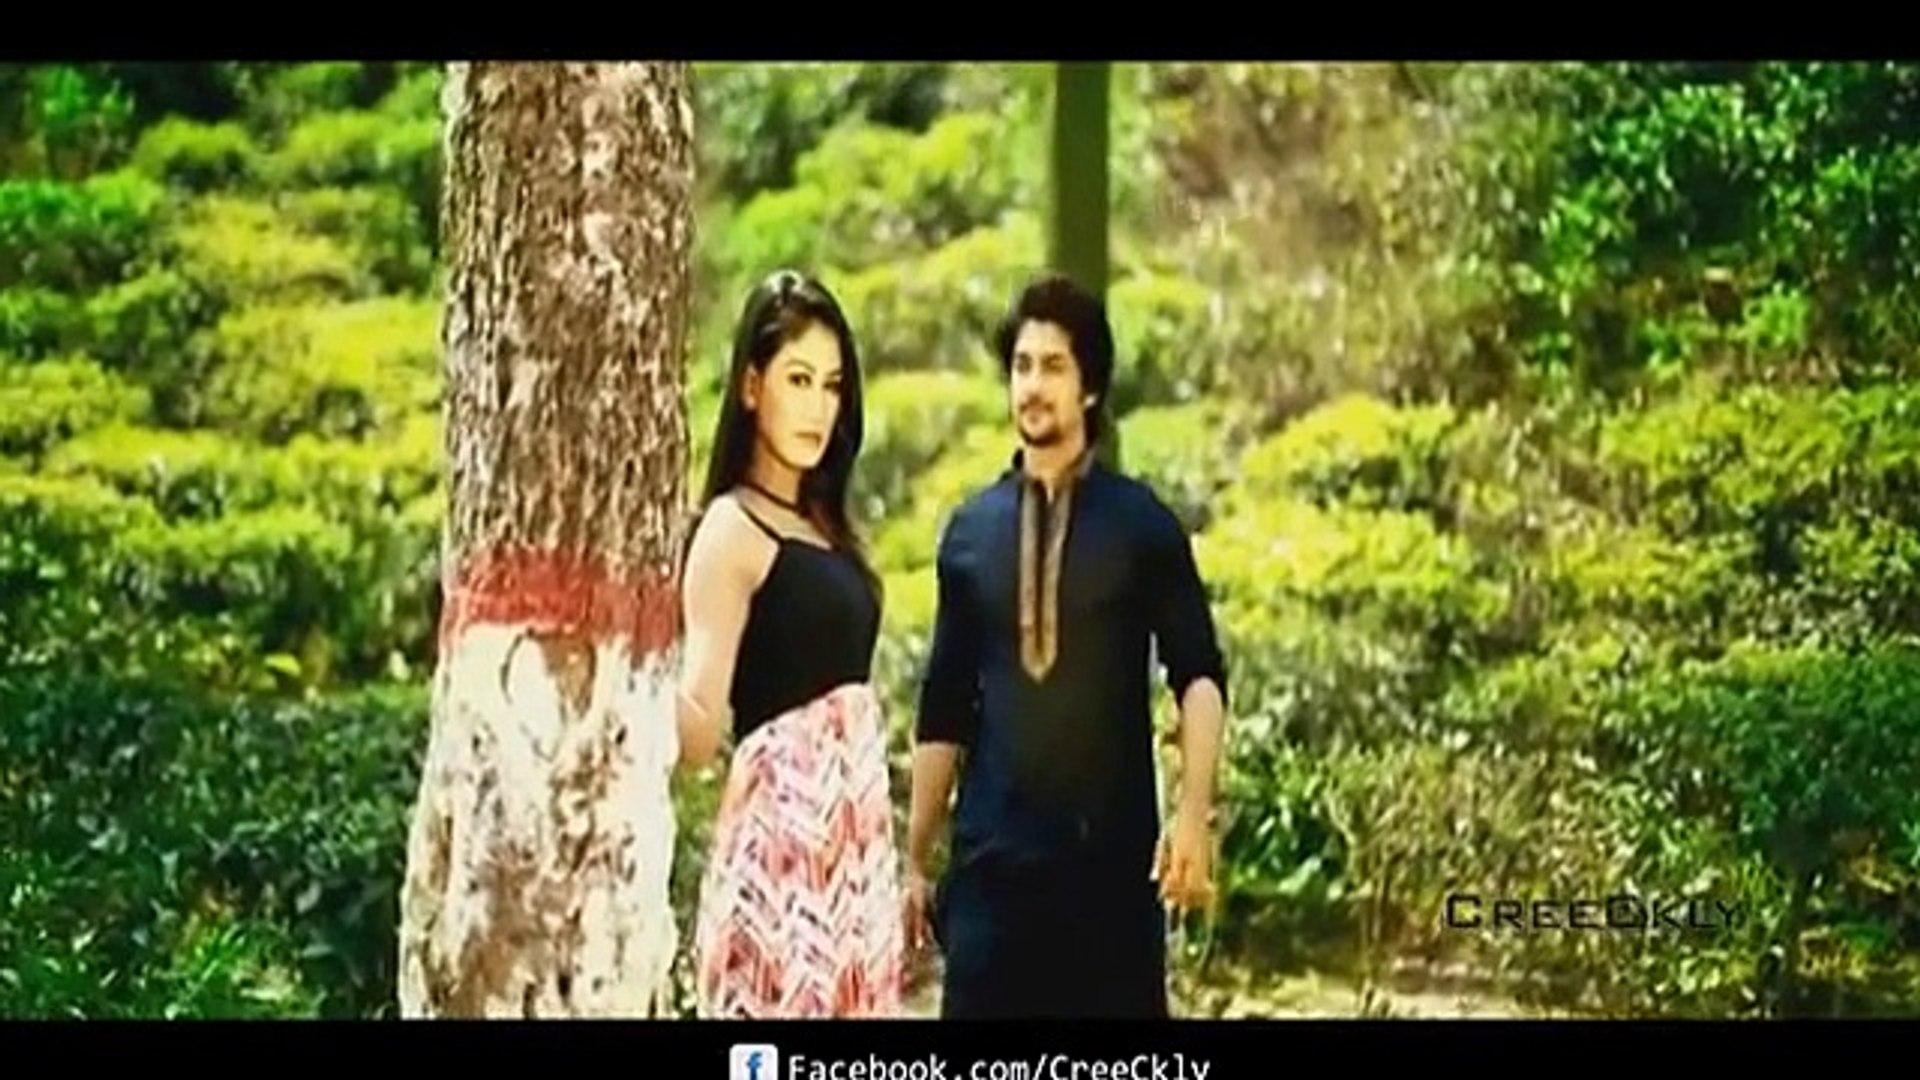 Arfin Rumey Naumi Ore Piya Bangla Song 2014 Official Music Video gan ;Arfin Rumey Naumi Ore Piya Ban